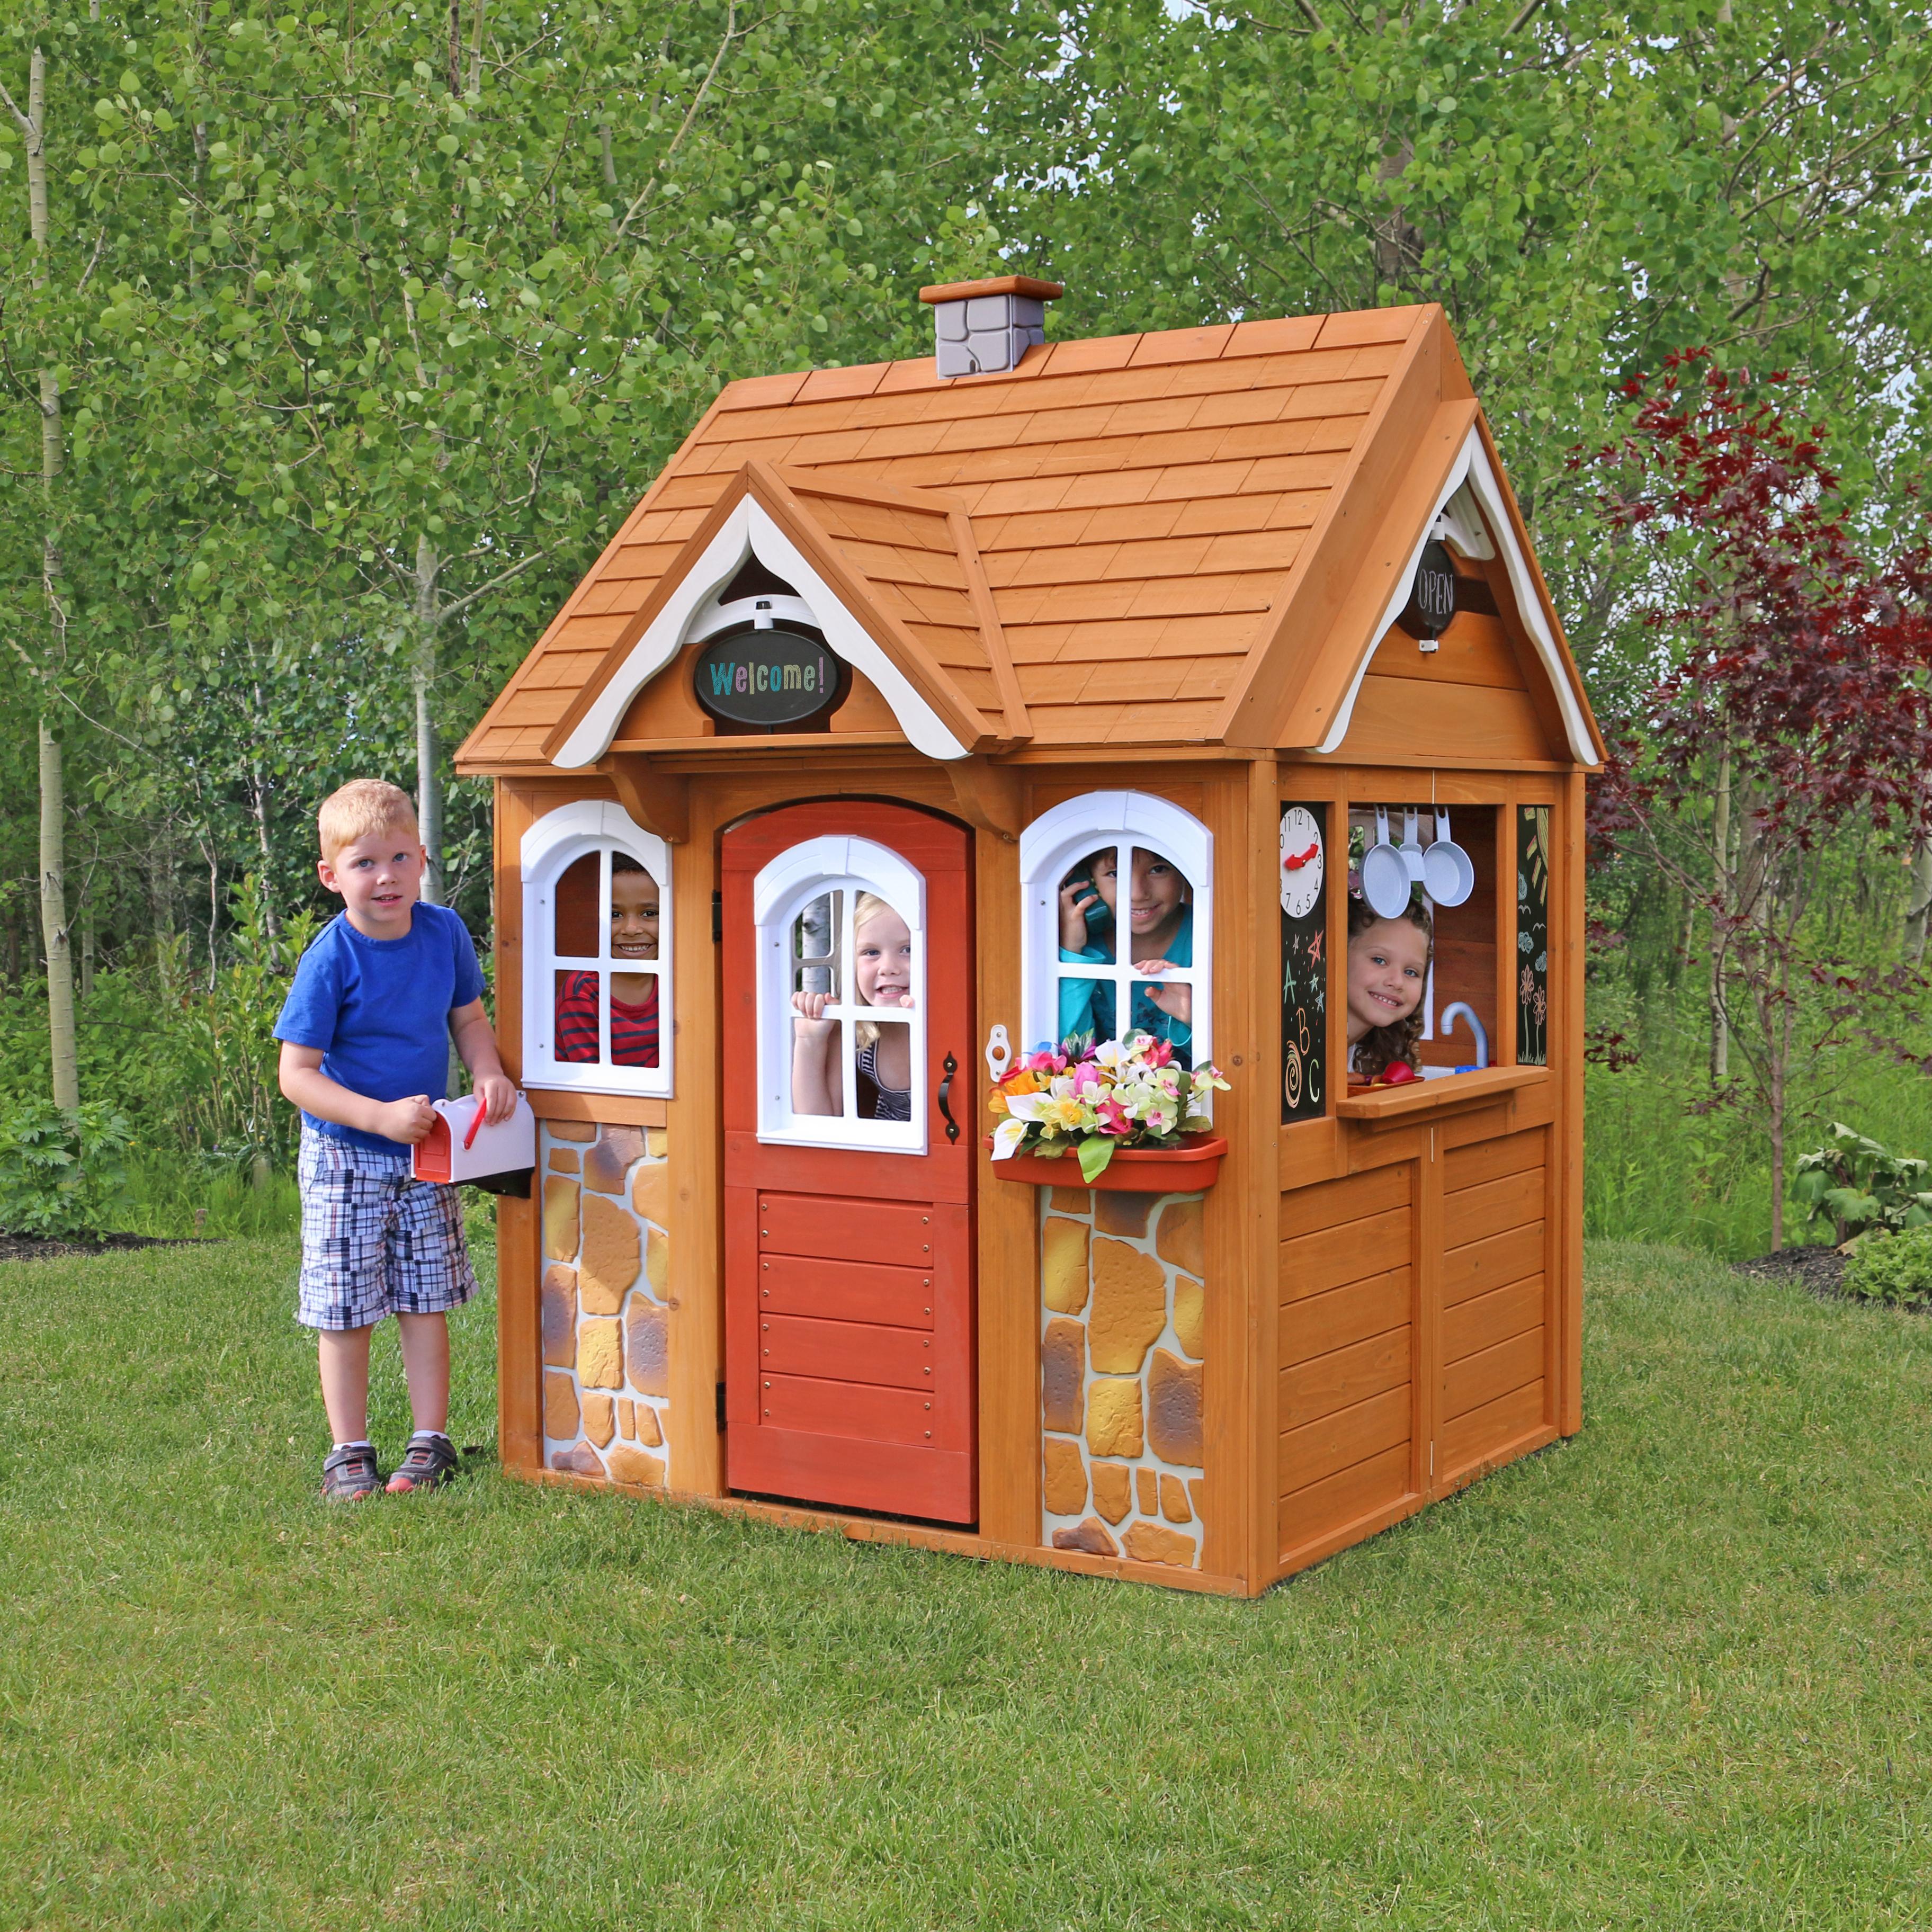 Kidkraft stoneycreek cedar outdoor playhouse litenleker - Casitas de juguete para ninas ...